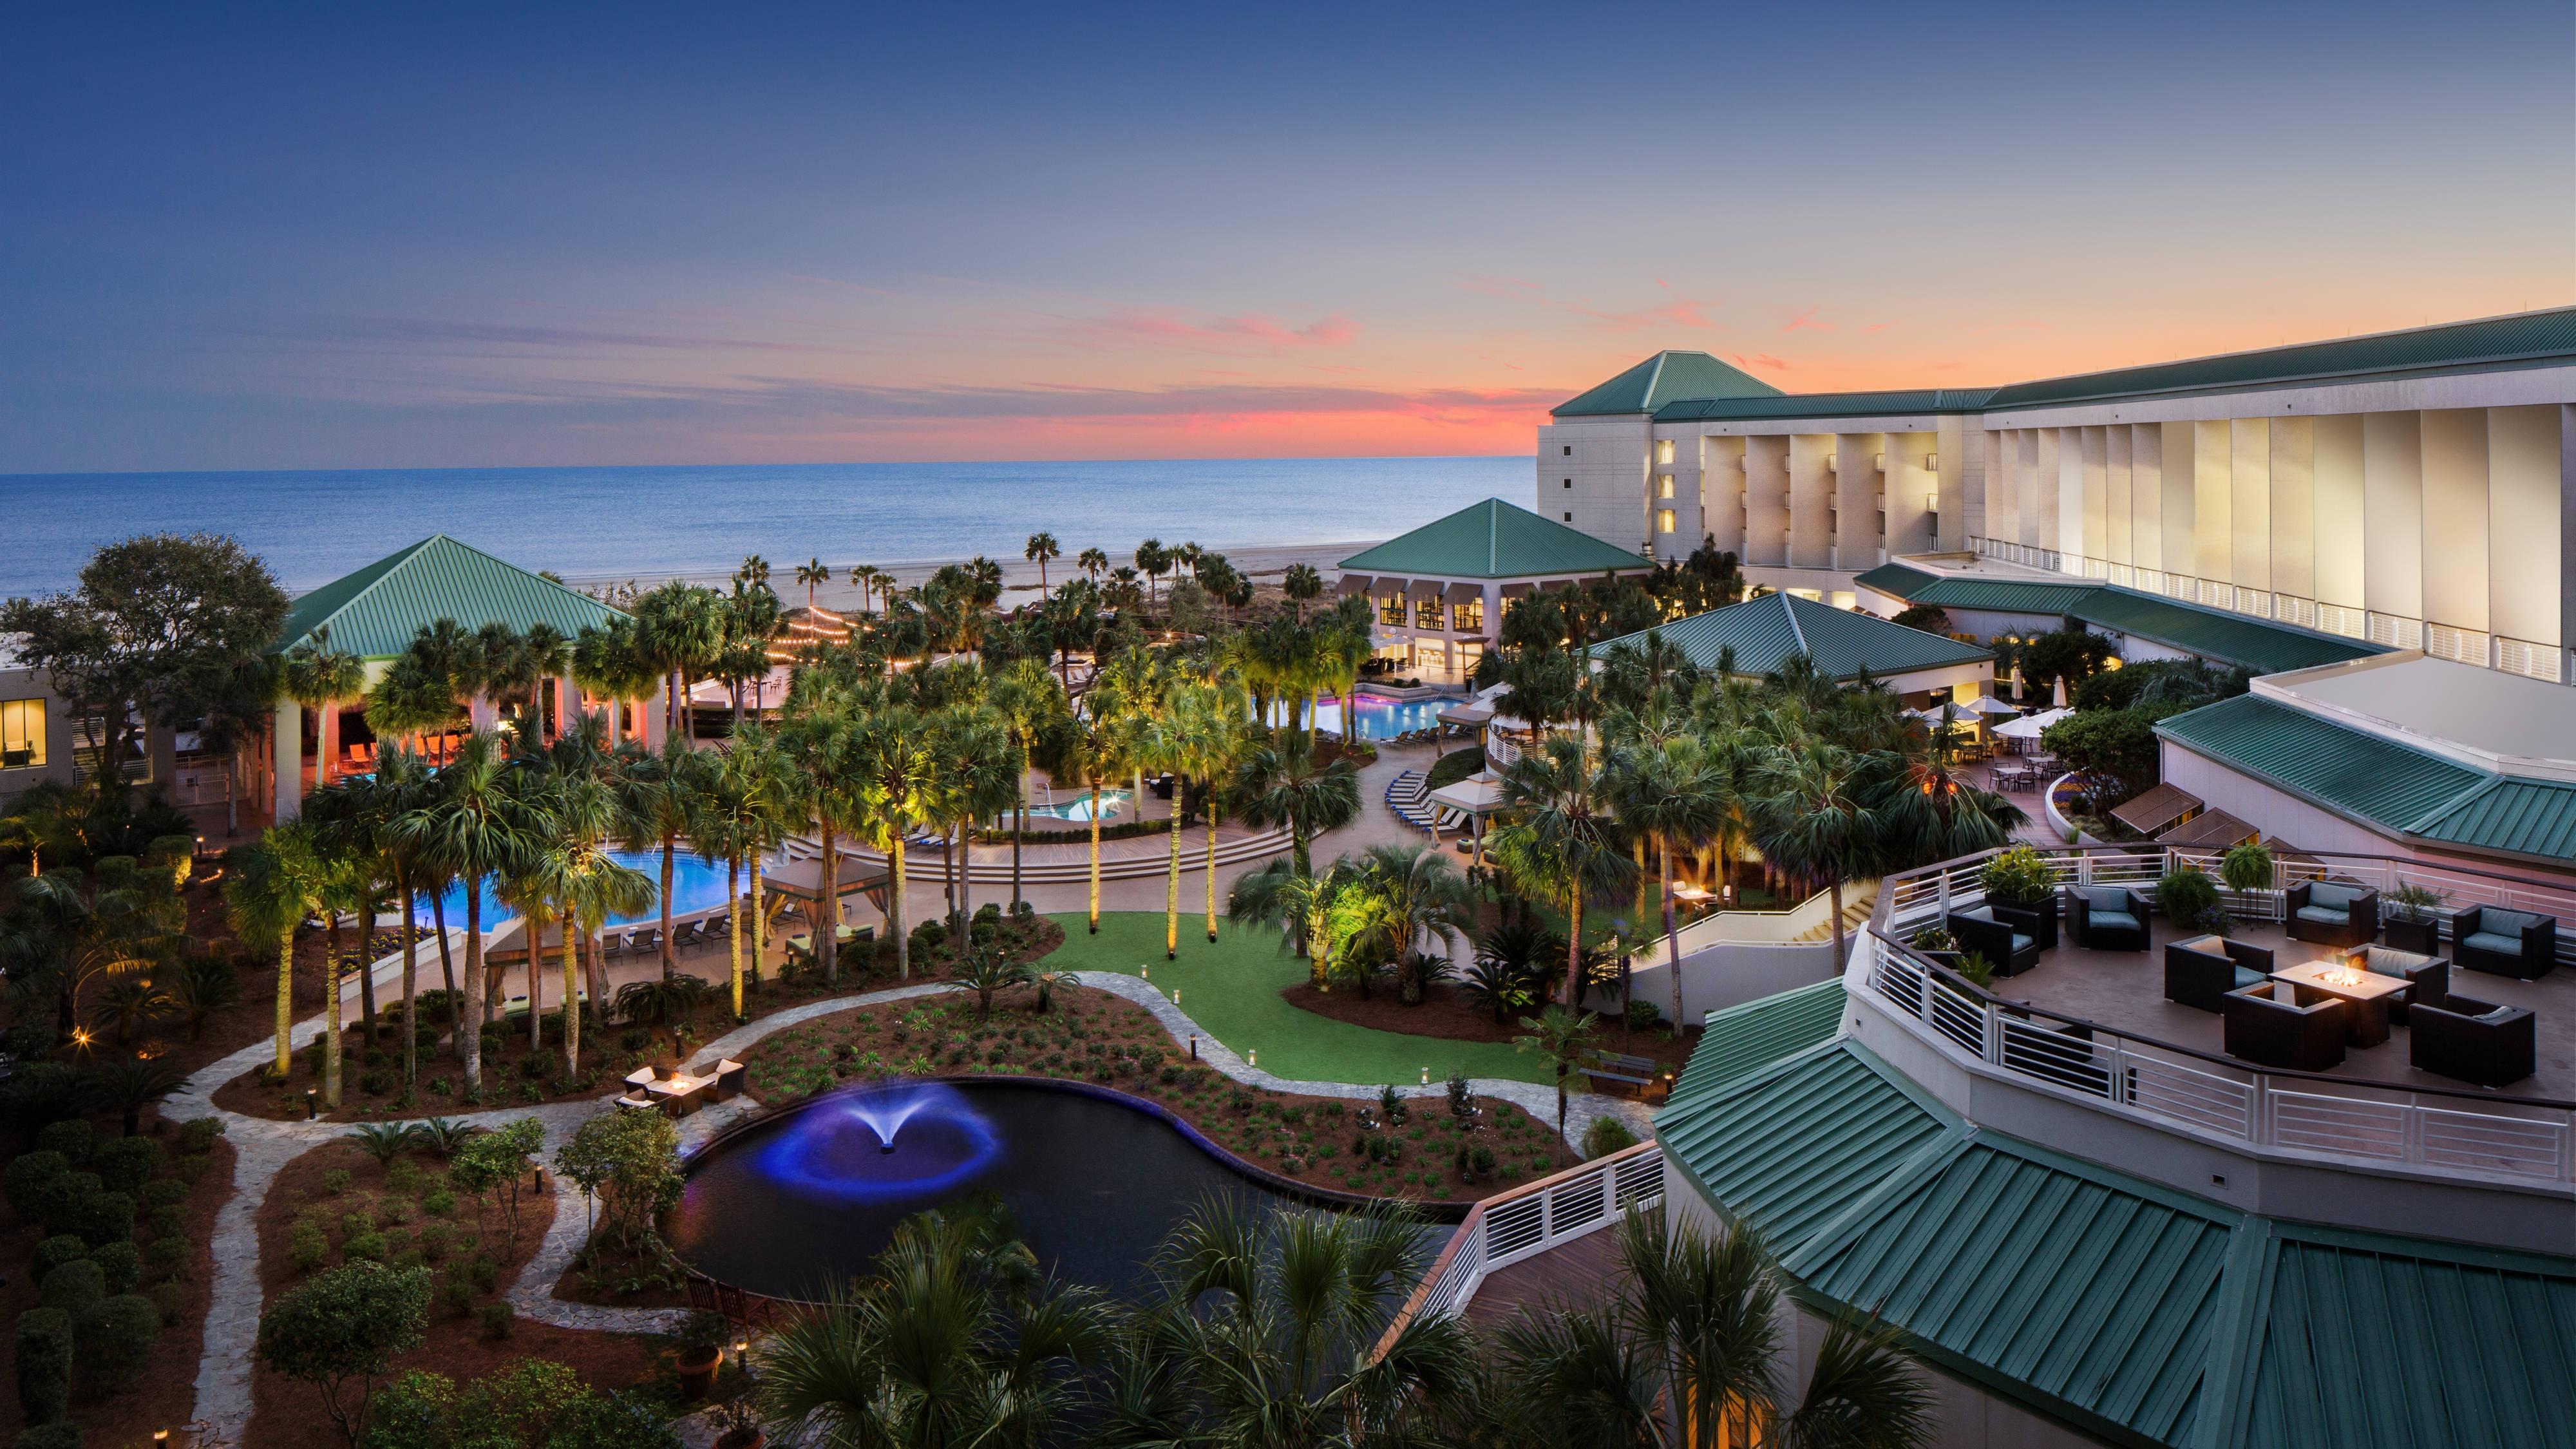 Westin Resort Hilton Head Island